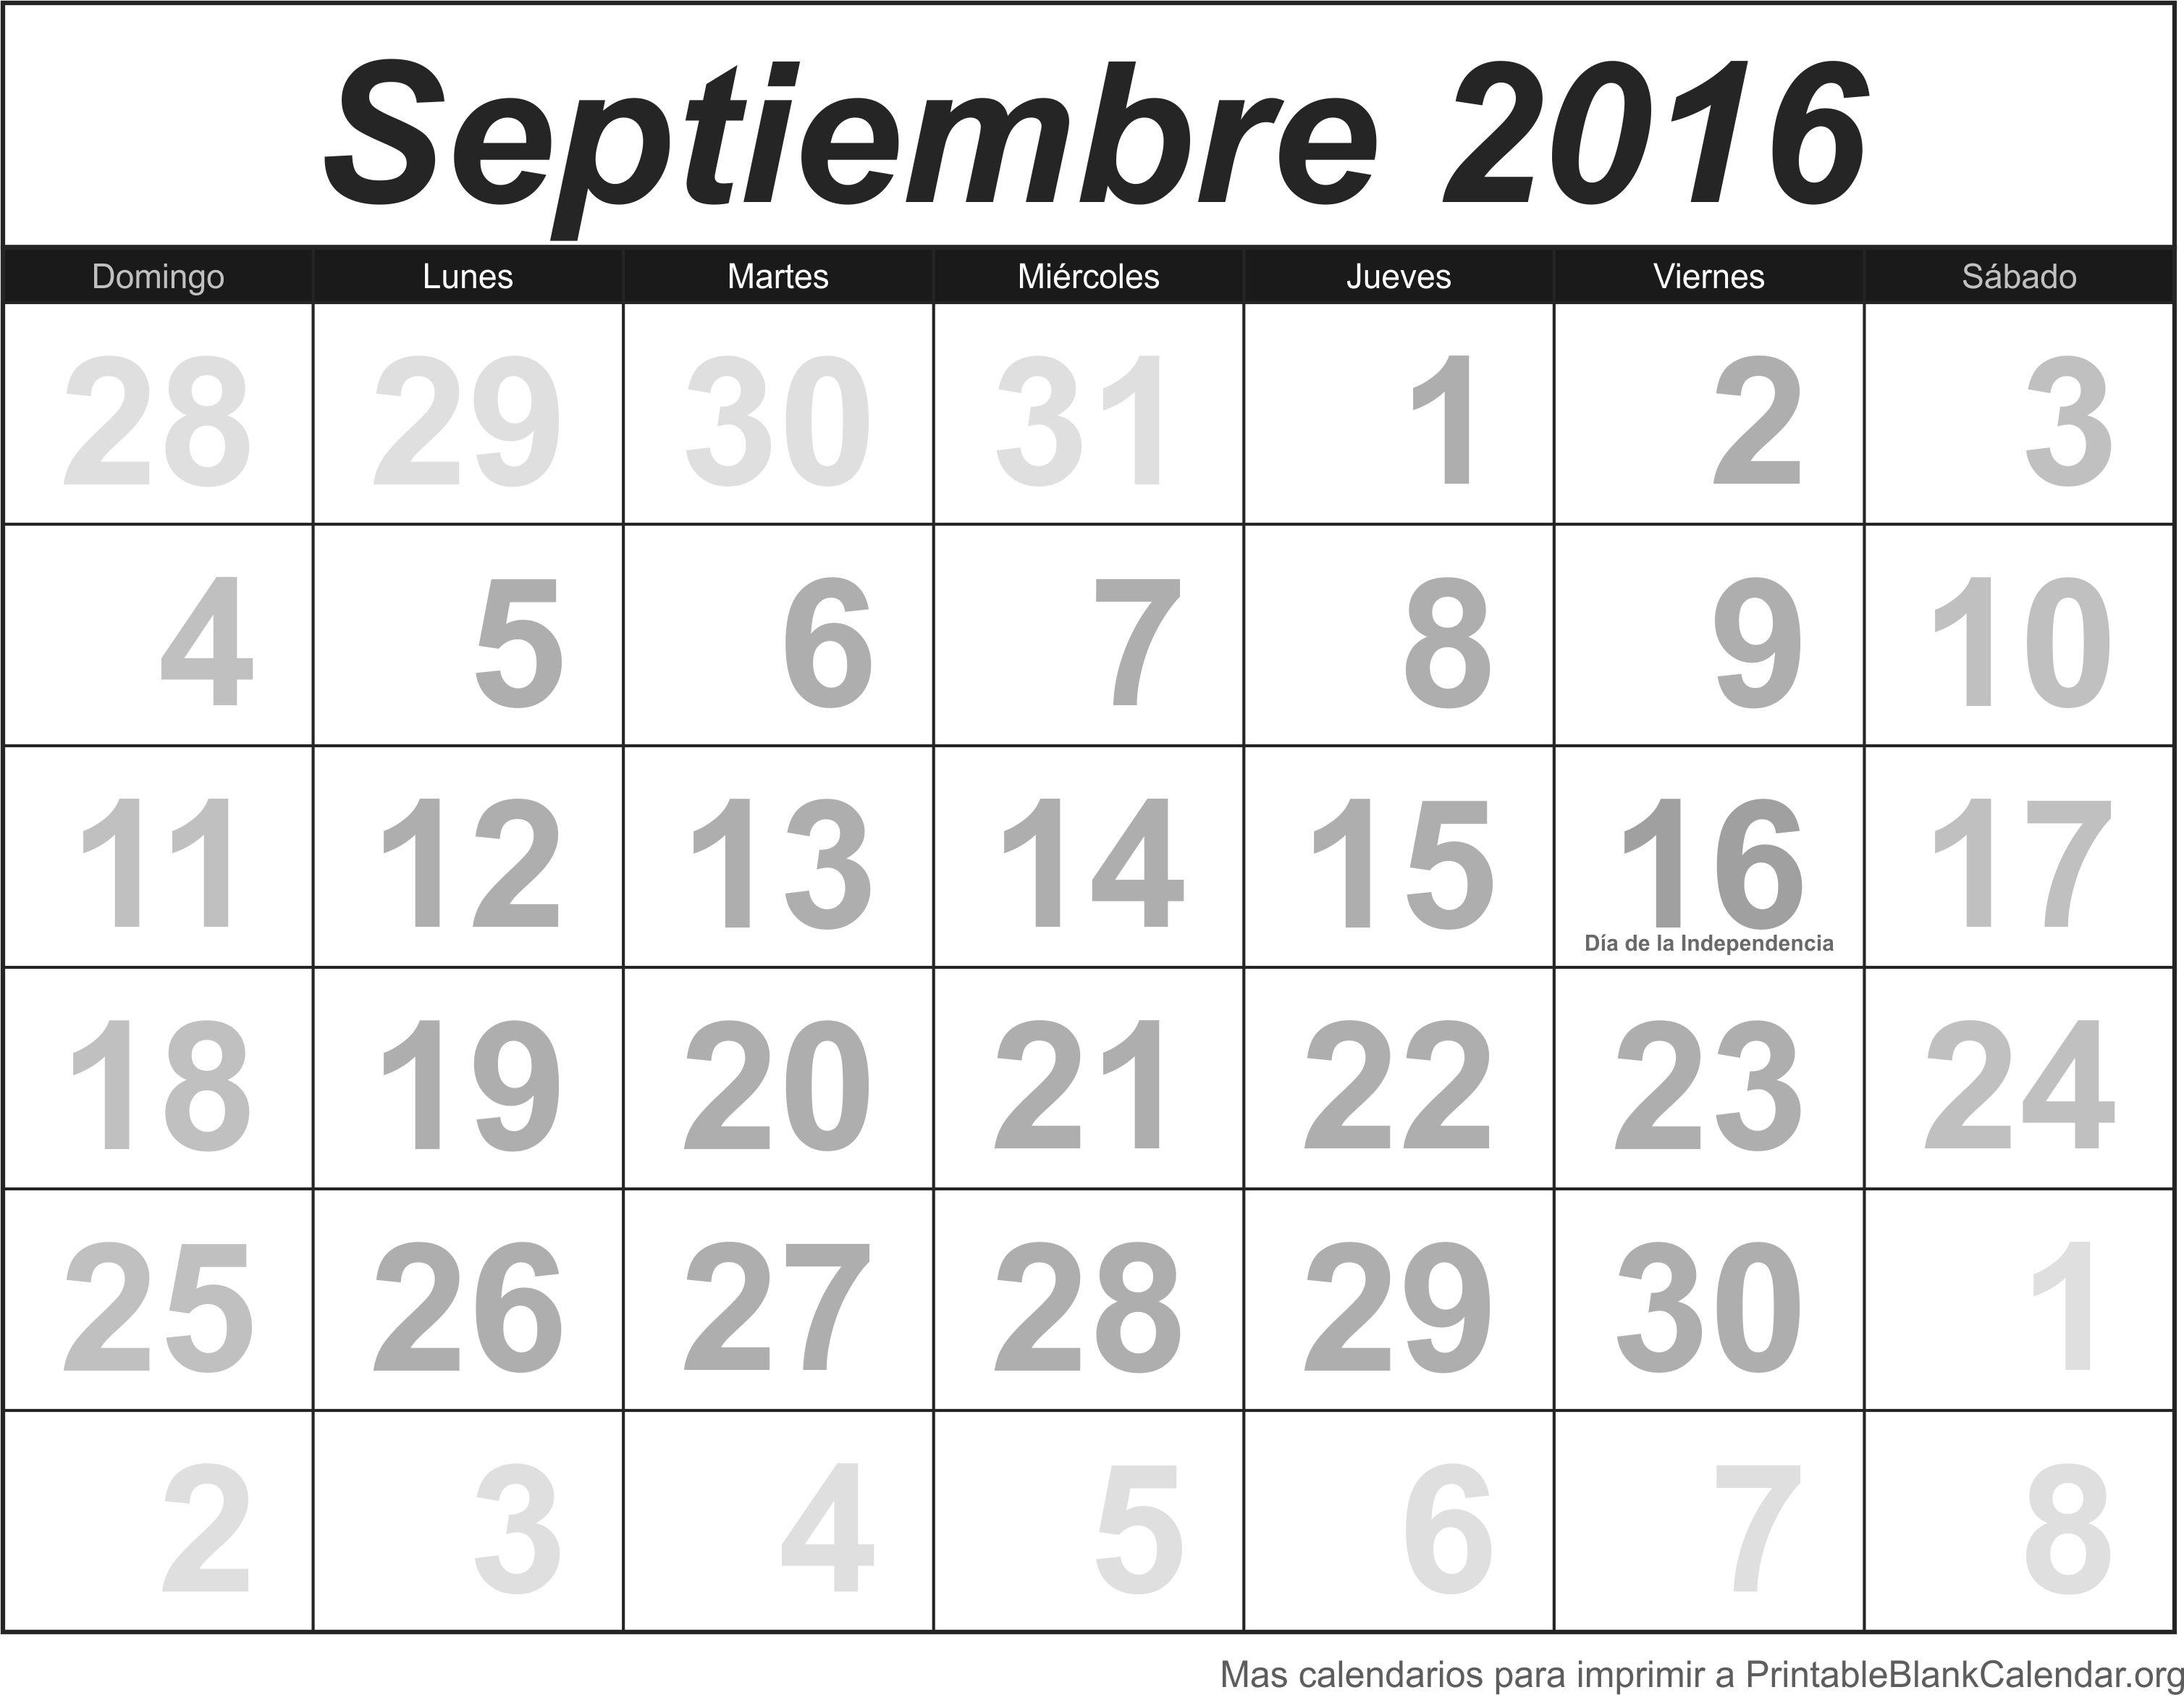 calendario para imprimir sep 2016